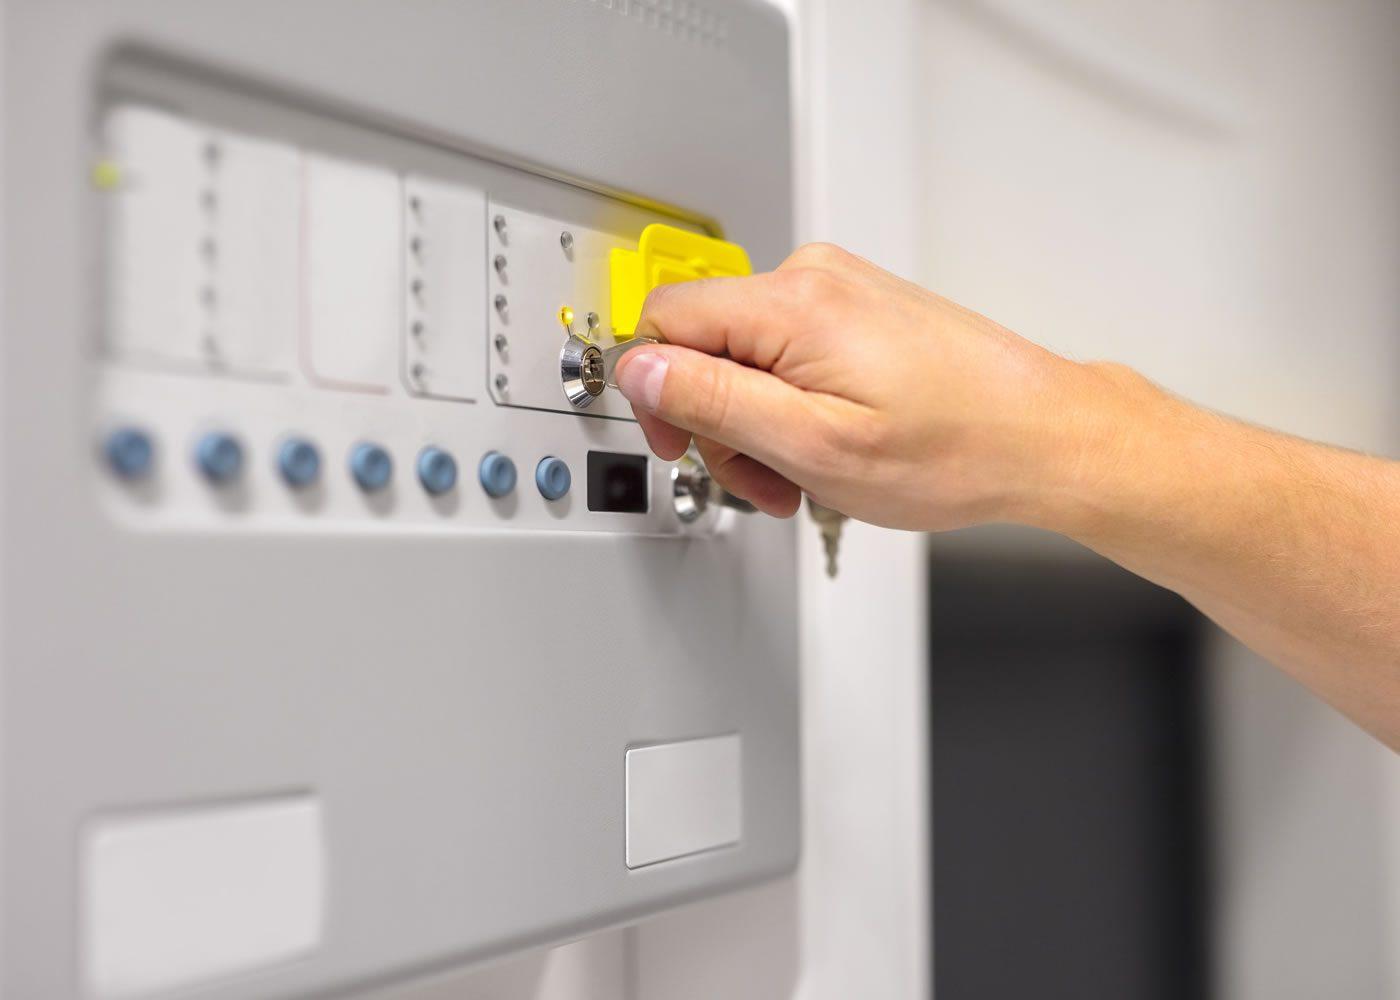 fire-alarm-control-panel